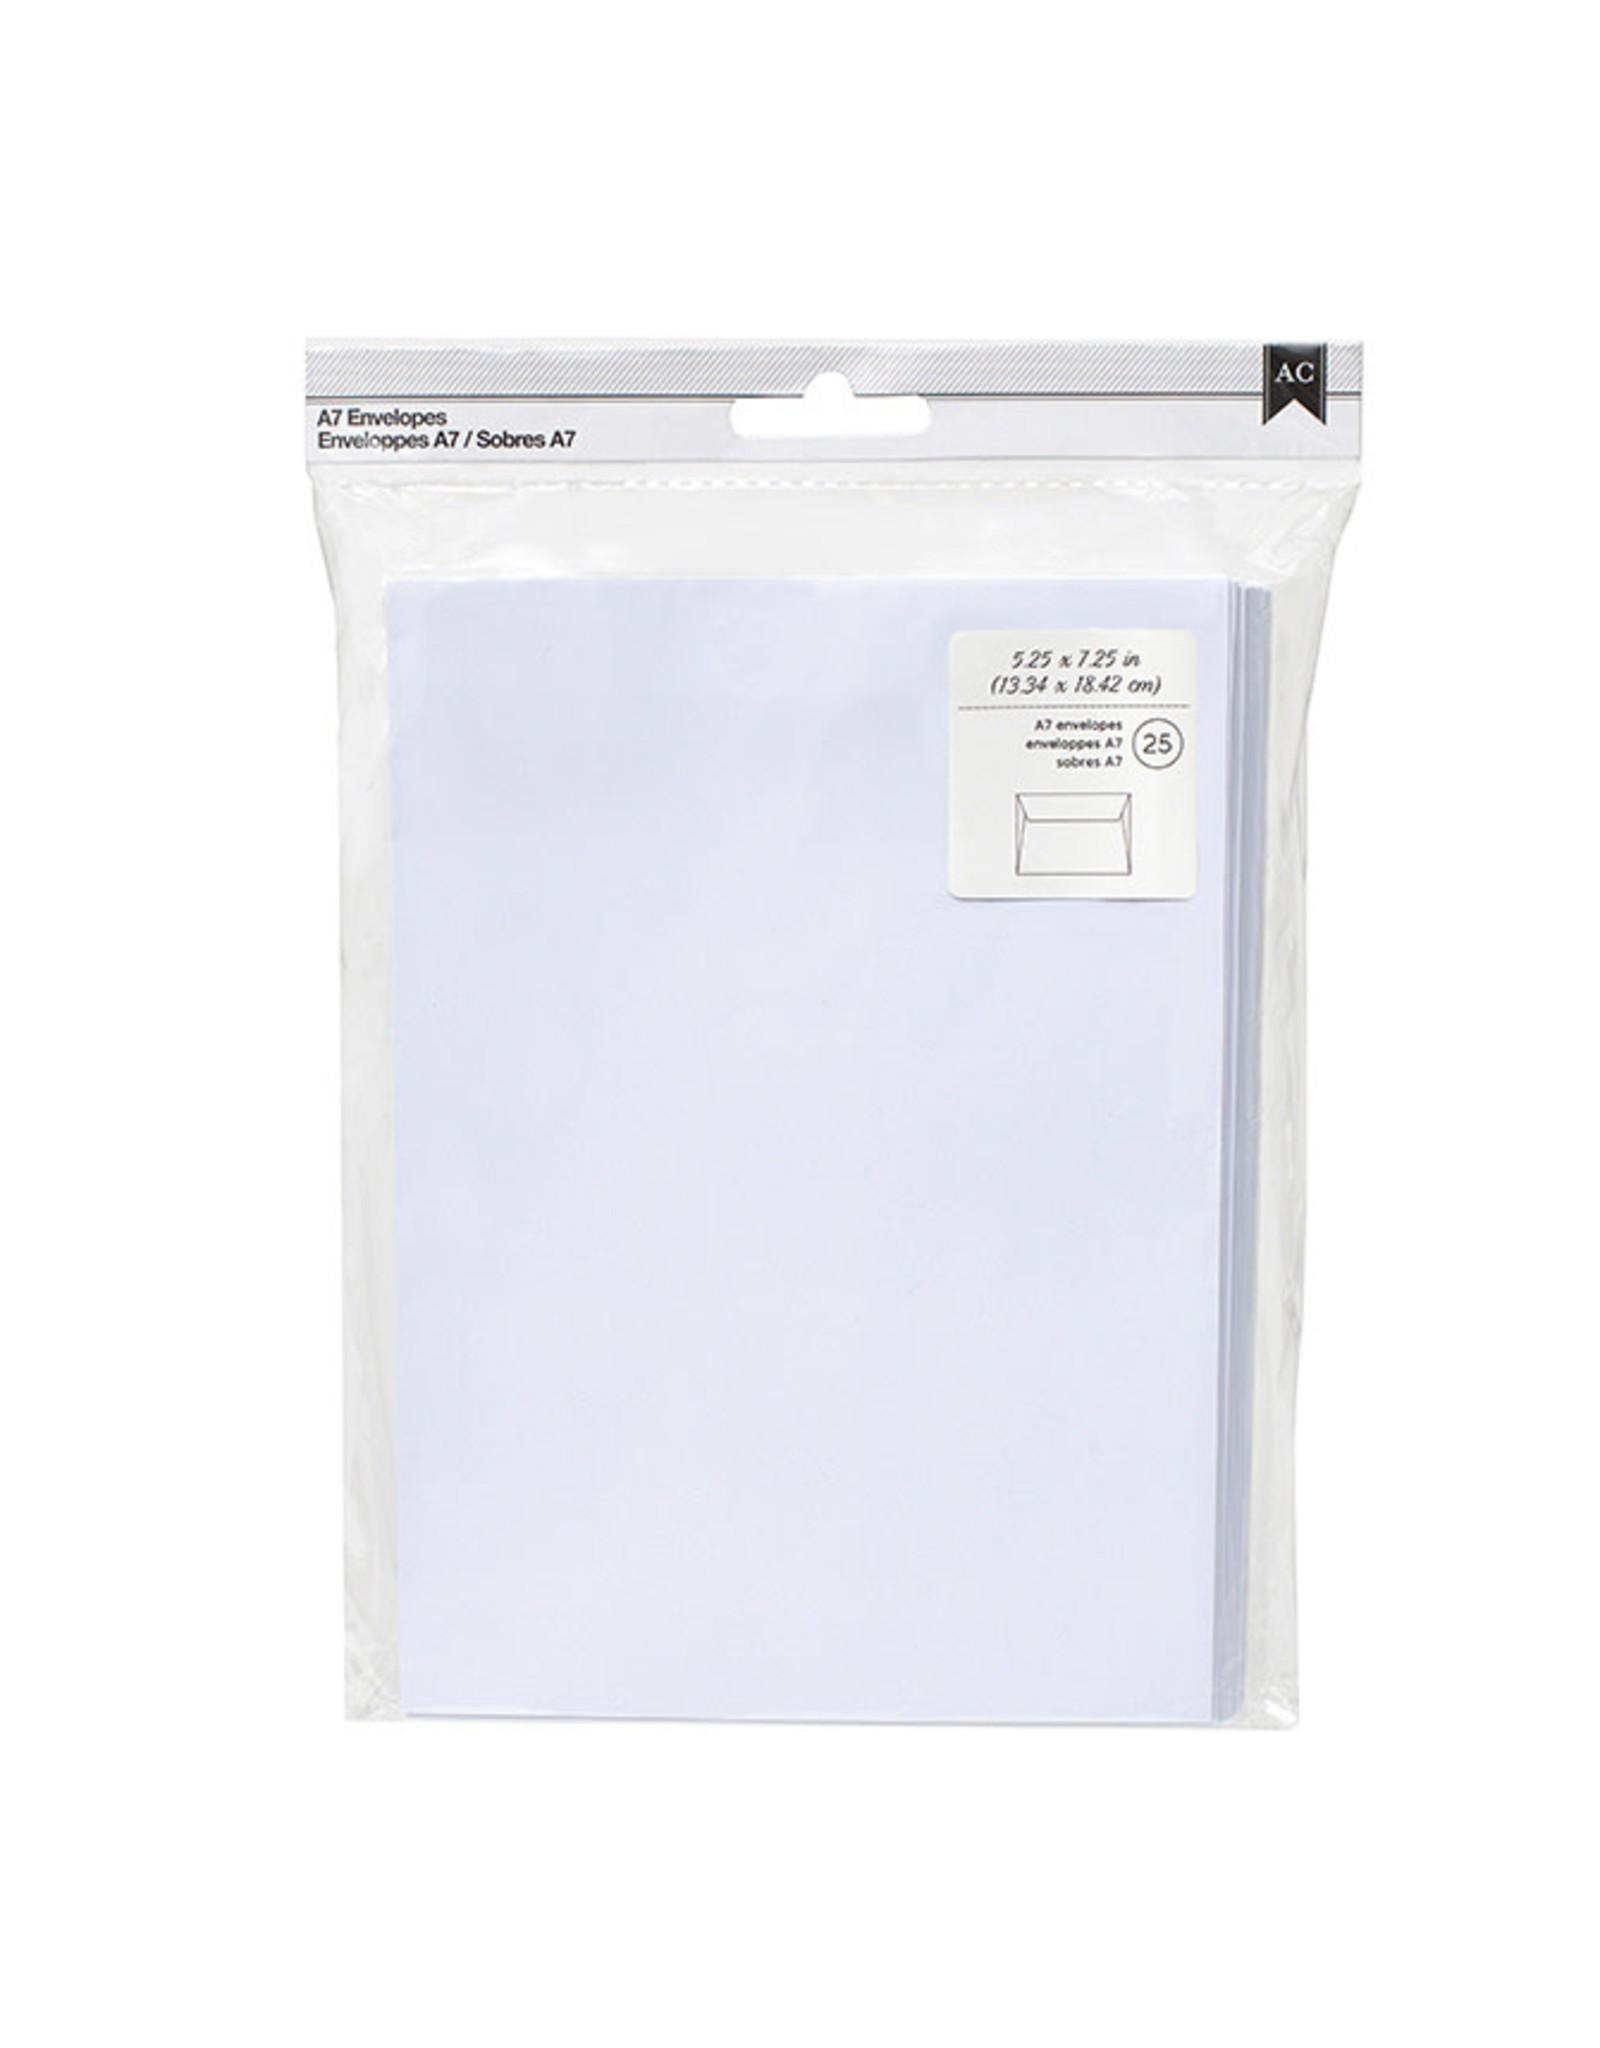 AMERICAN CRAFTS AC - Envelopes - a7 - 5.25 x 7.25 - white (25 piece)